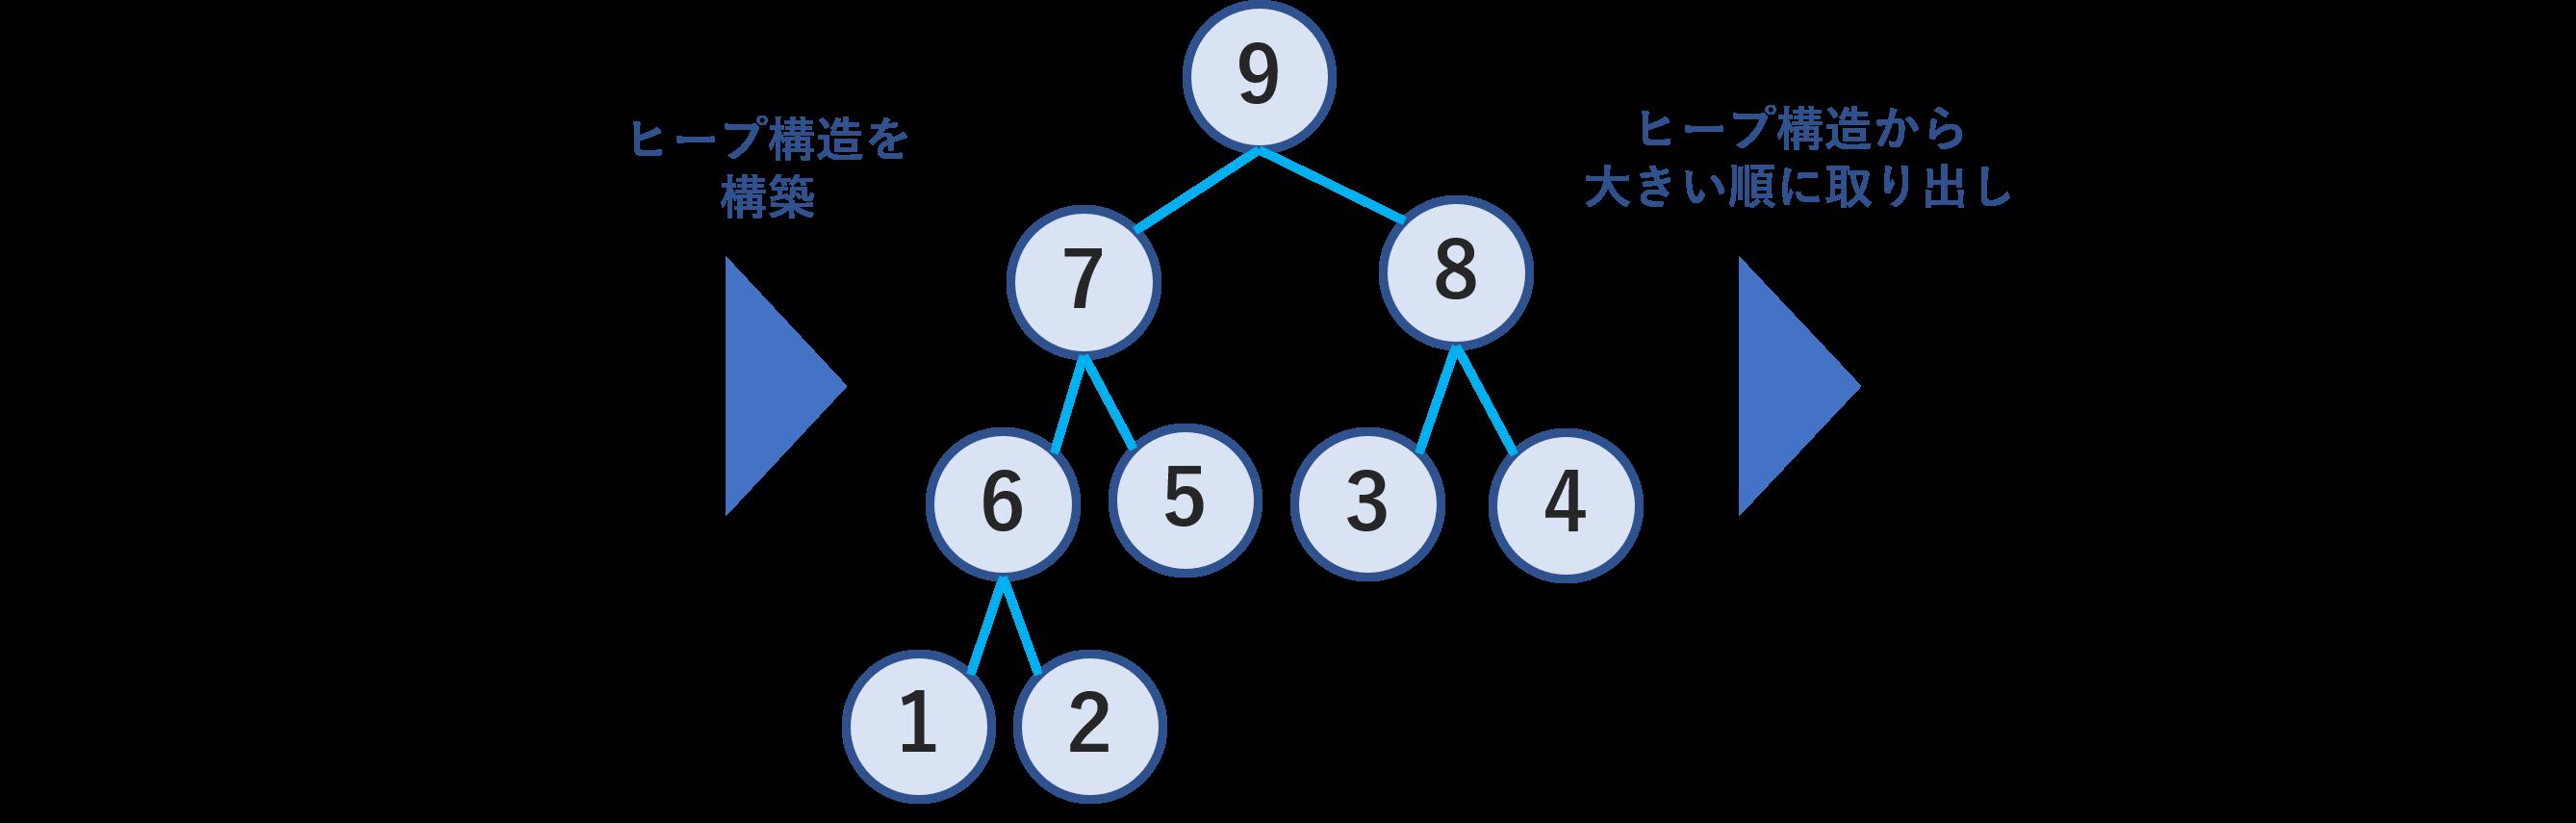 heap_image01